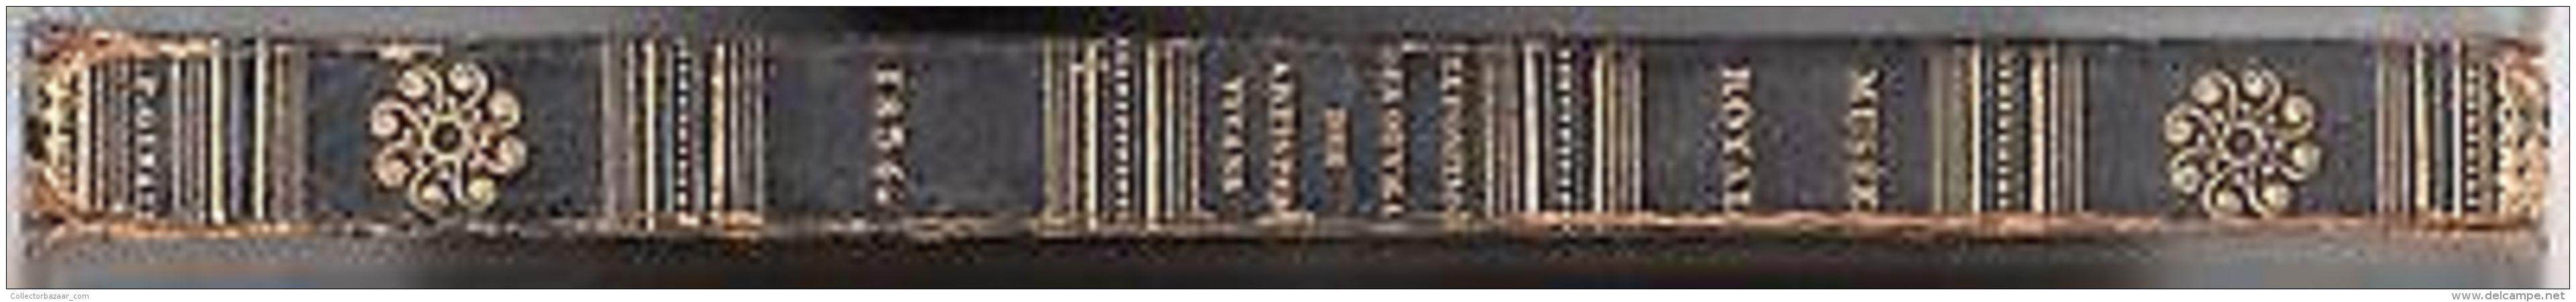 1834 The Official Paris Salon Catalogue Art Binding Signed R P Ginain Desirable - Books, Magazines, Comics